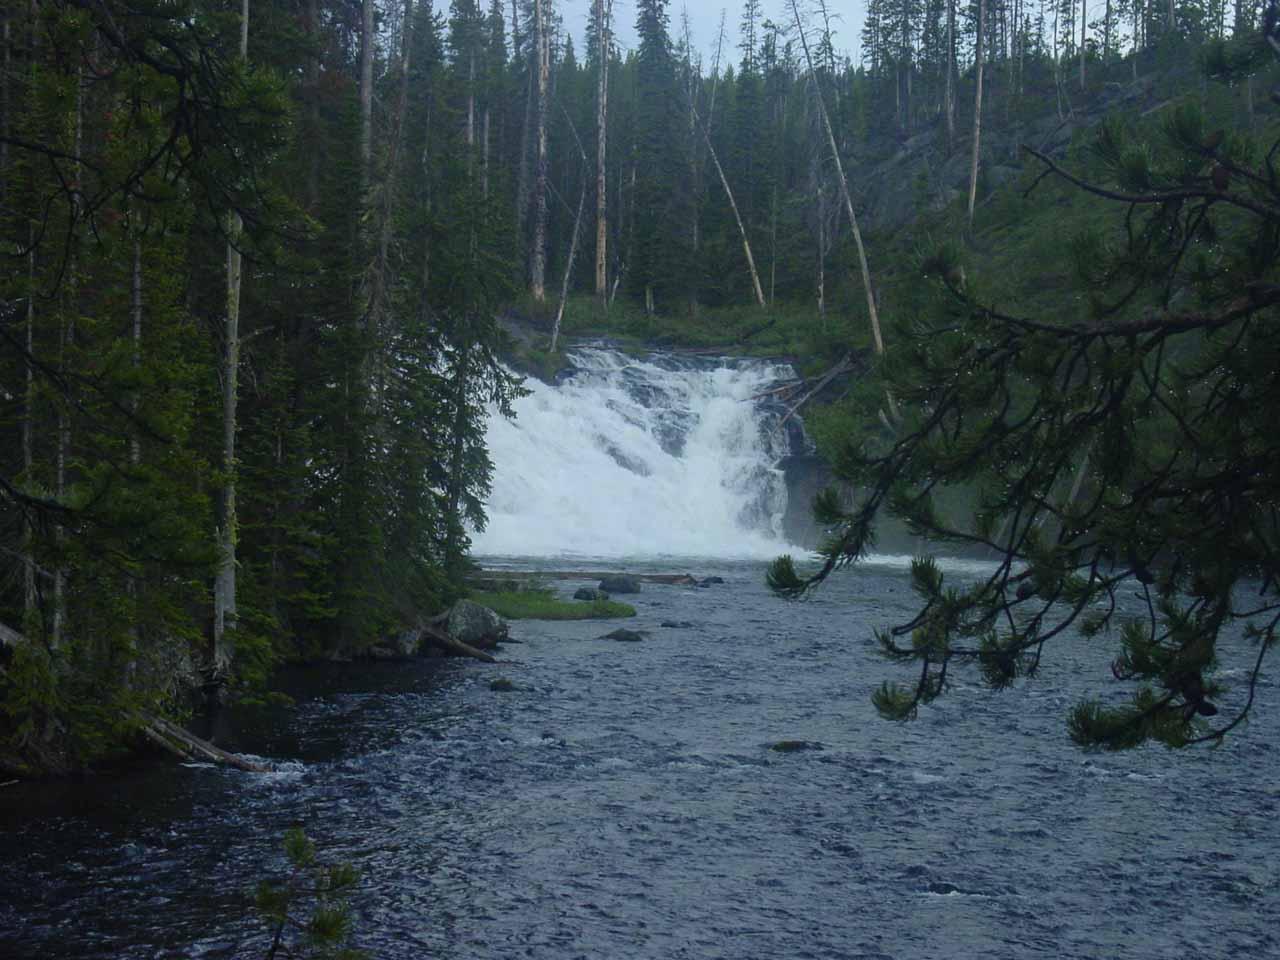 Last look at Lewis Falls